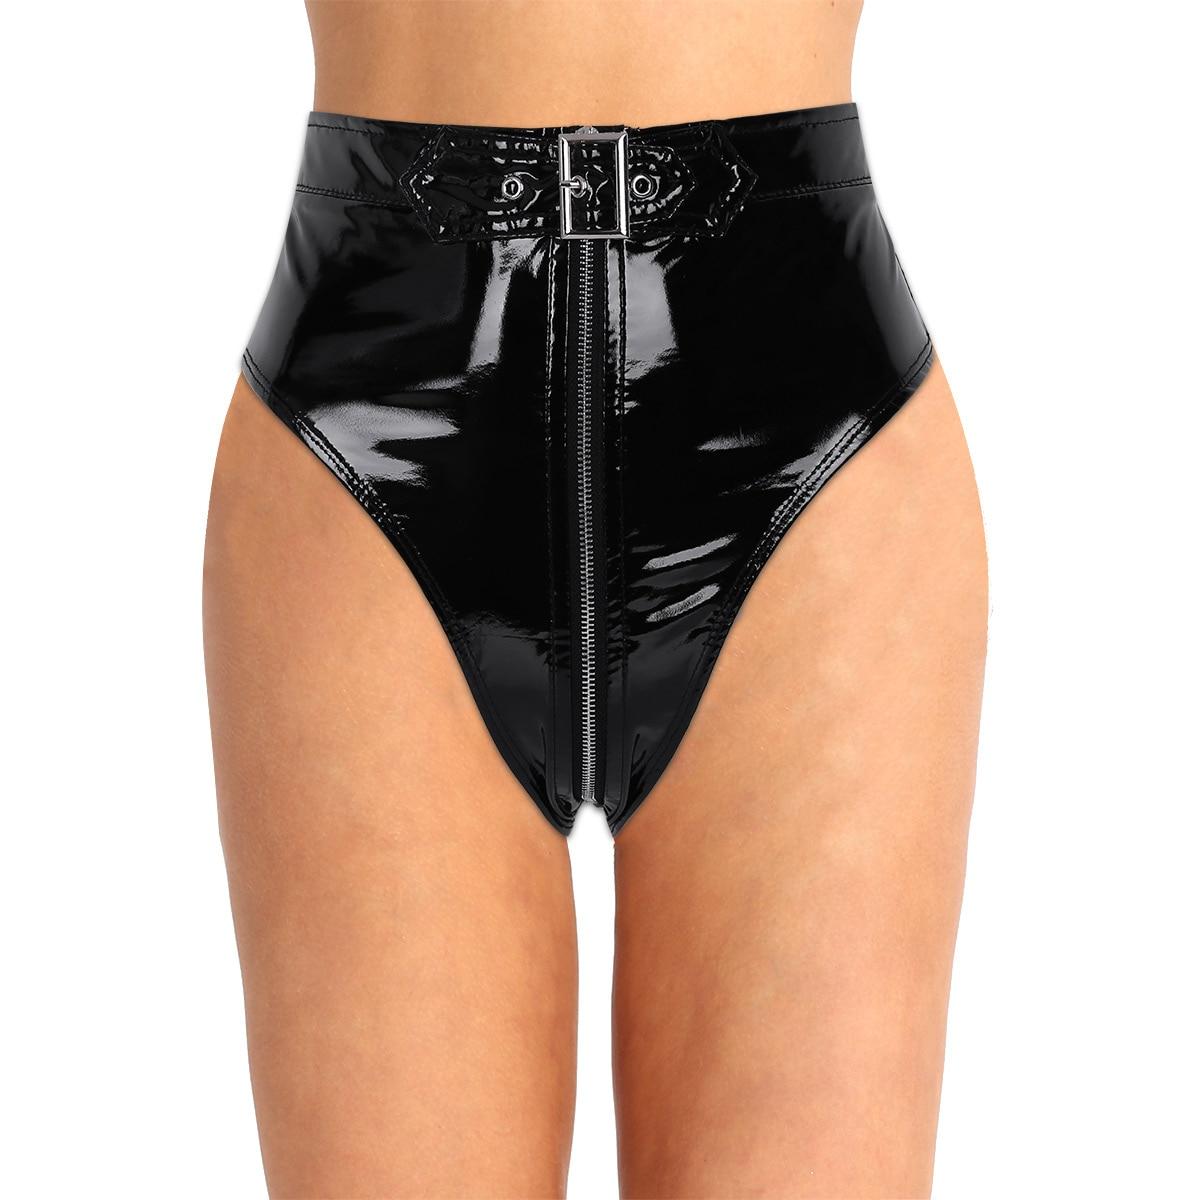 0ad3da30506 MSemis Women Wet Look Lingerie Women High Cut Underwear Sexy Thongs Panties  Booty Shorts PVC Thong Zippered with Belt Briefs